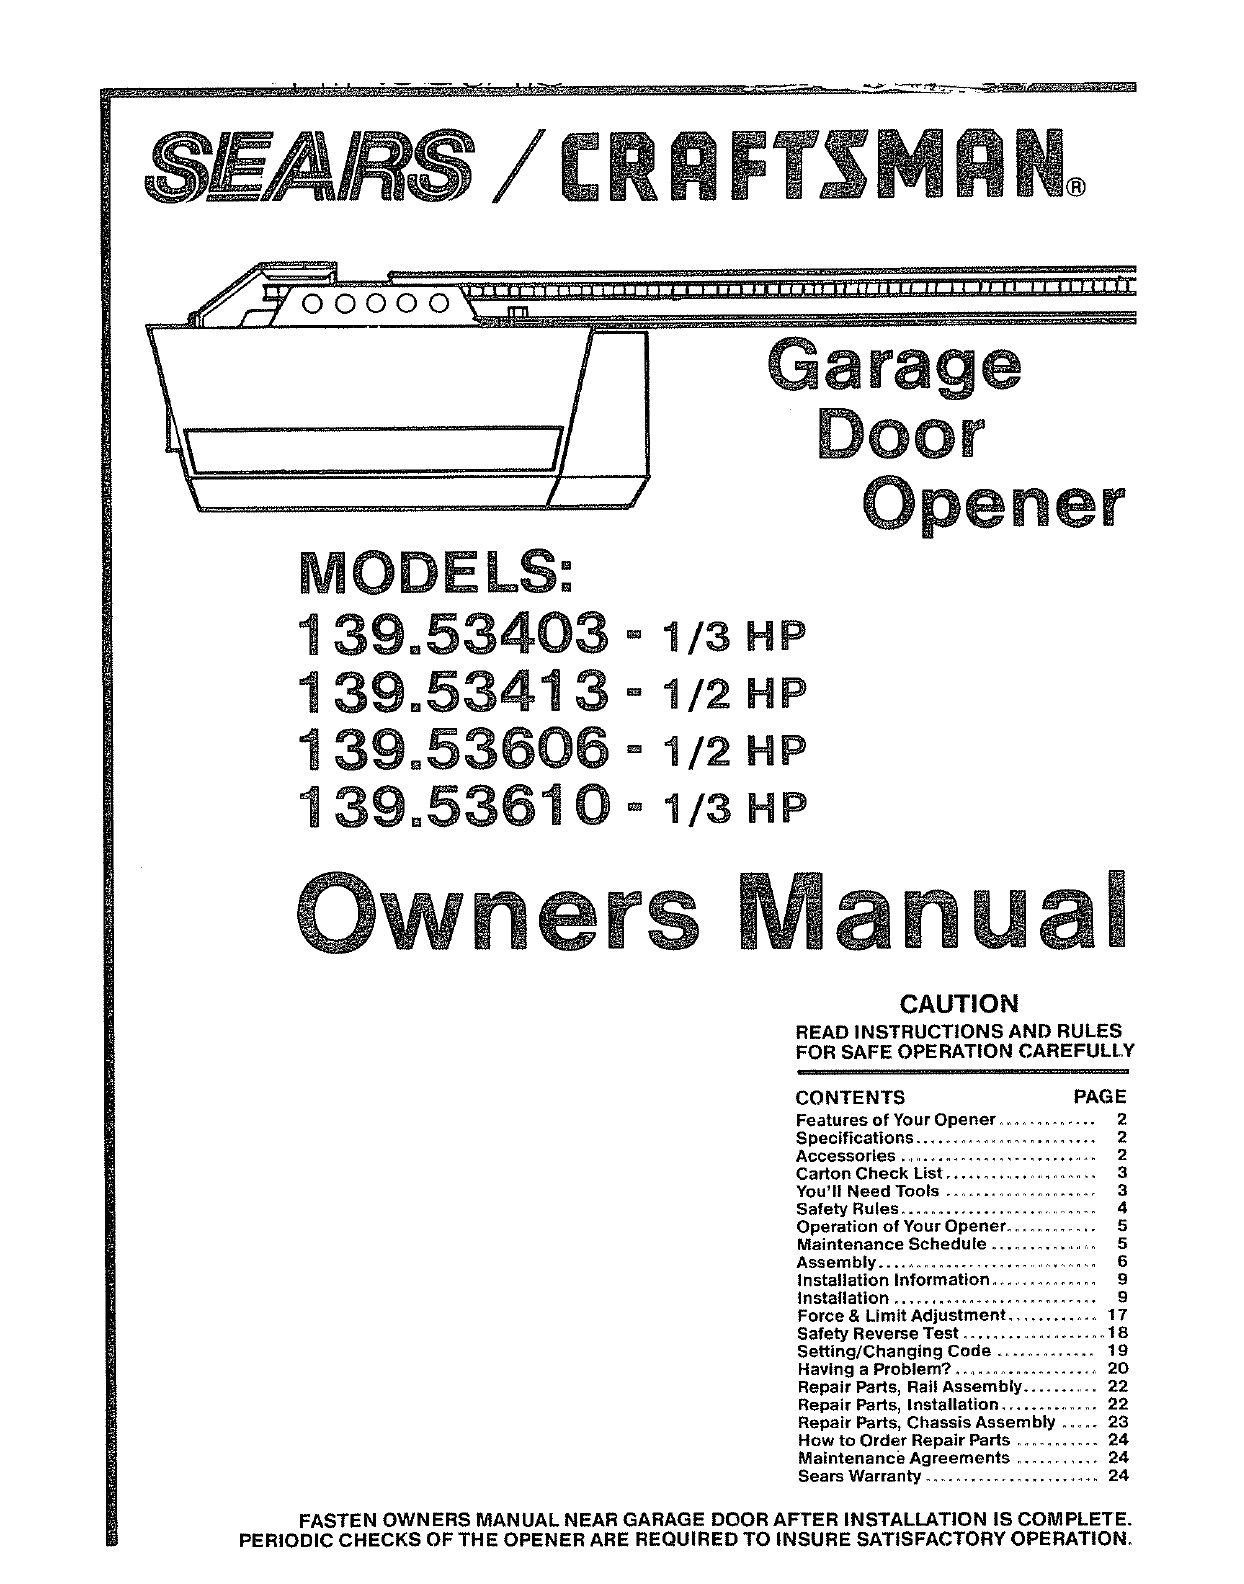 Garage Door Safety Sensor Wiring : garage, safety, sensor, wiring, Craftsman, Garage, Sensor, Wiring, Diagram, Smart, Scotts-s1989.au-delice-limousin.fr